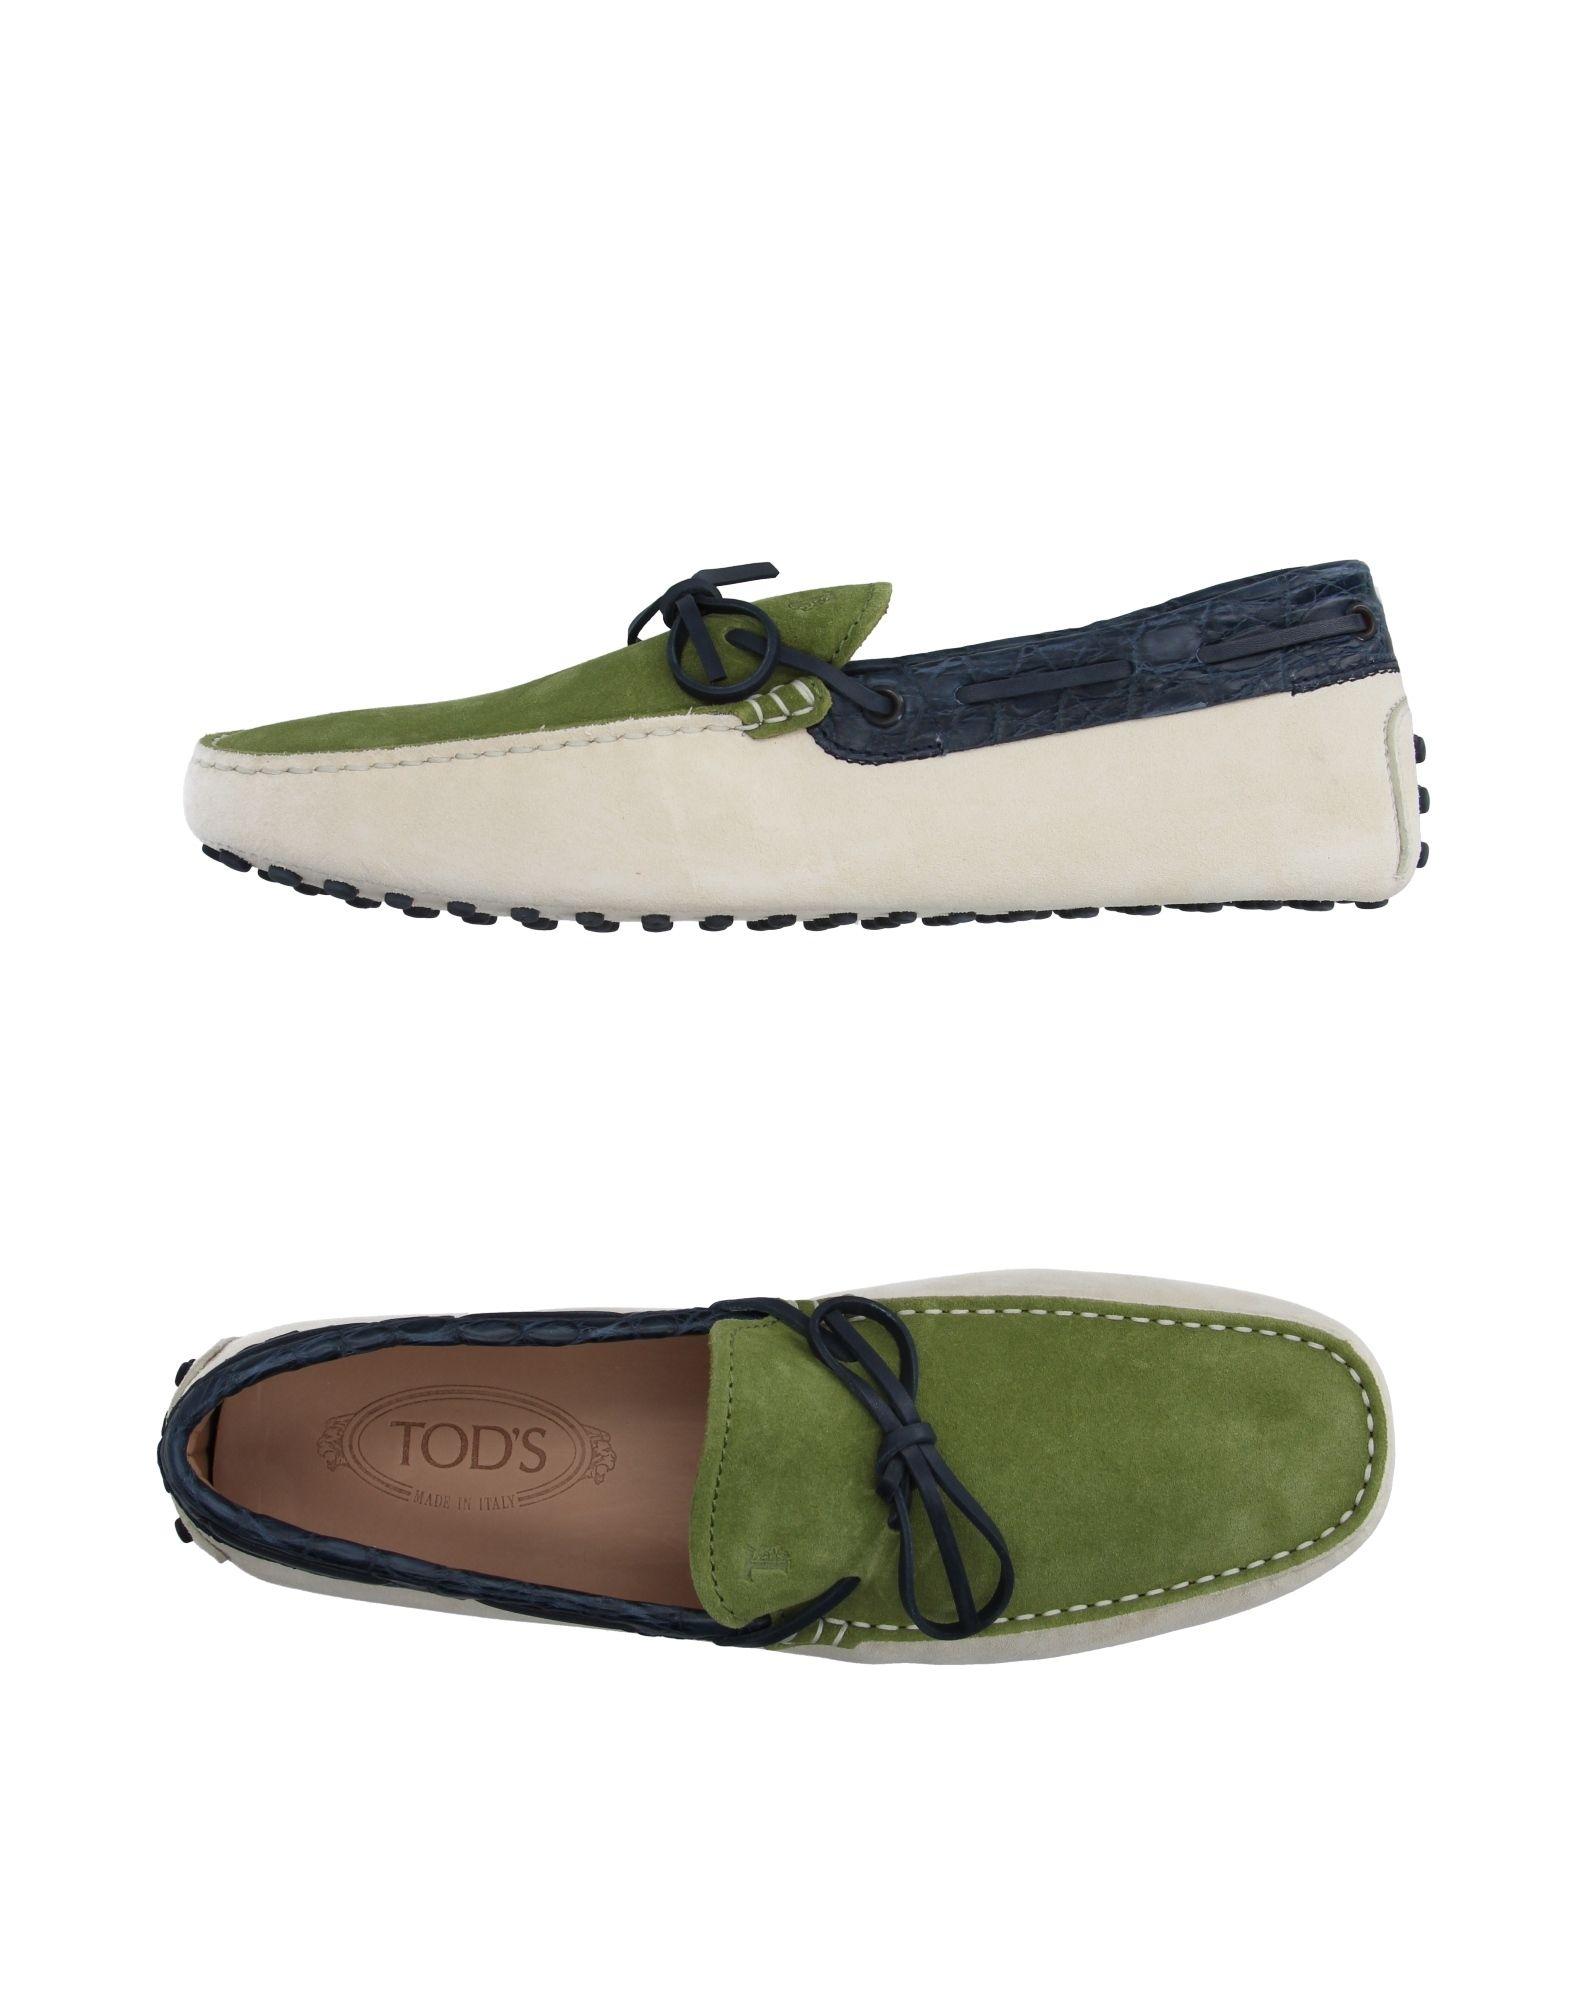 Tod's Mokassins Herren  11147616FU Gute Qualität beliebte Schuhe